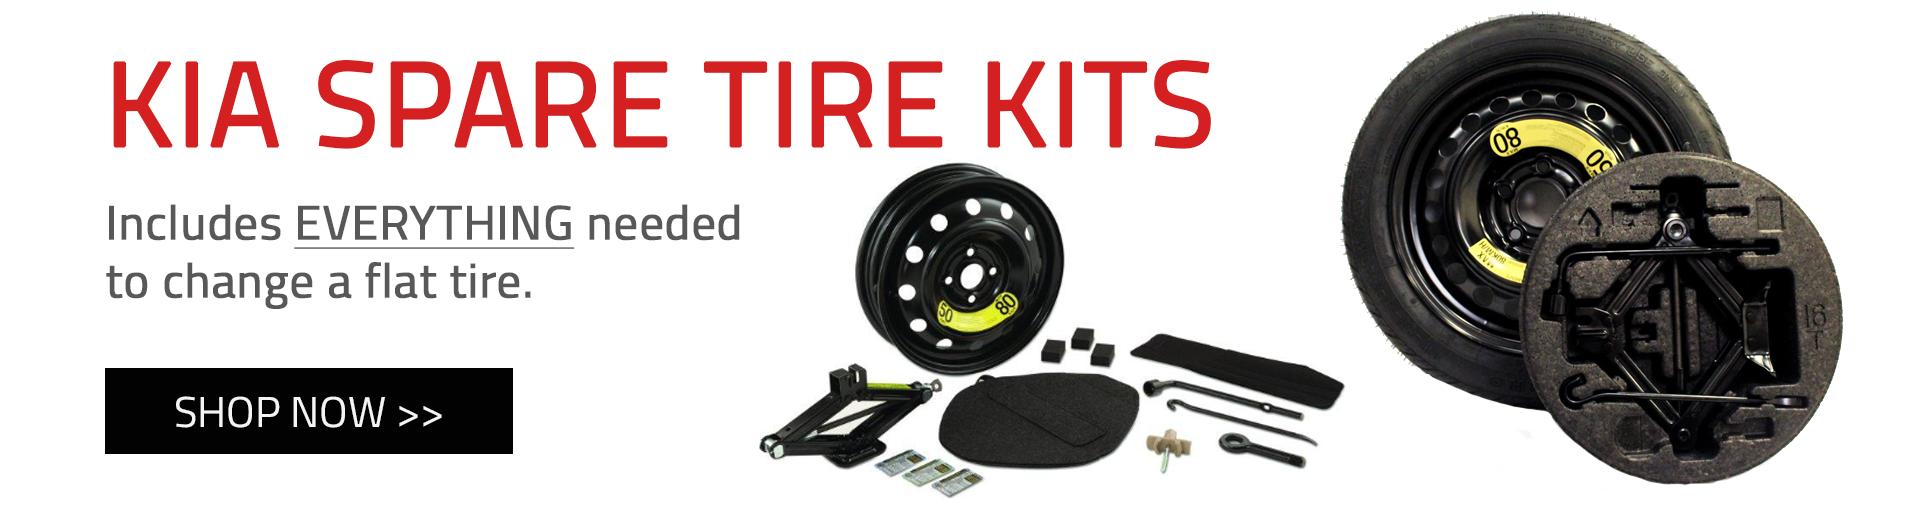 Kia Spare Tire Kits